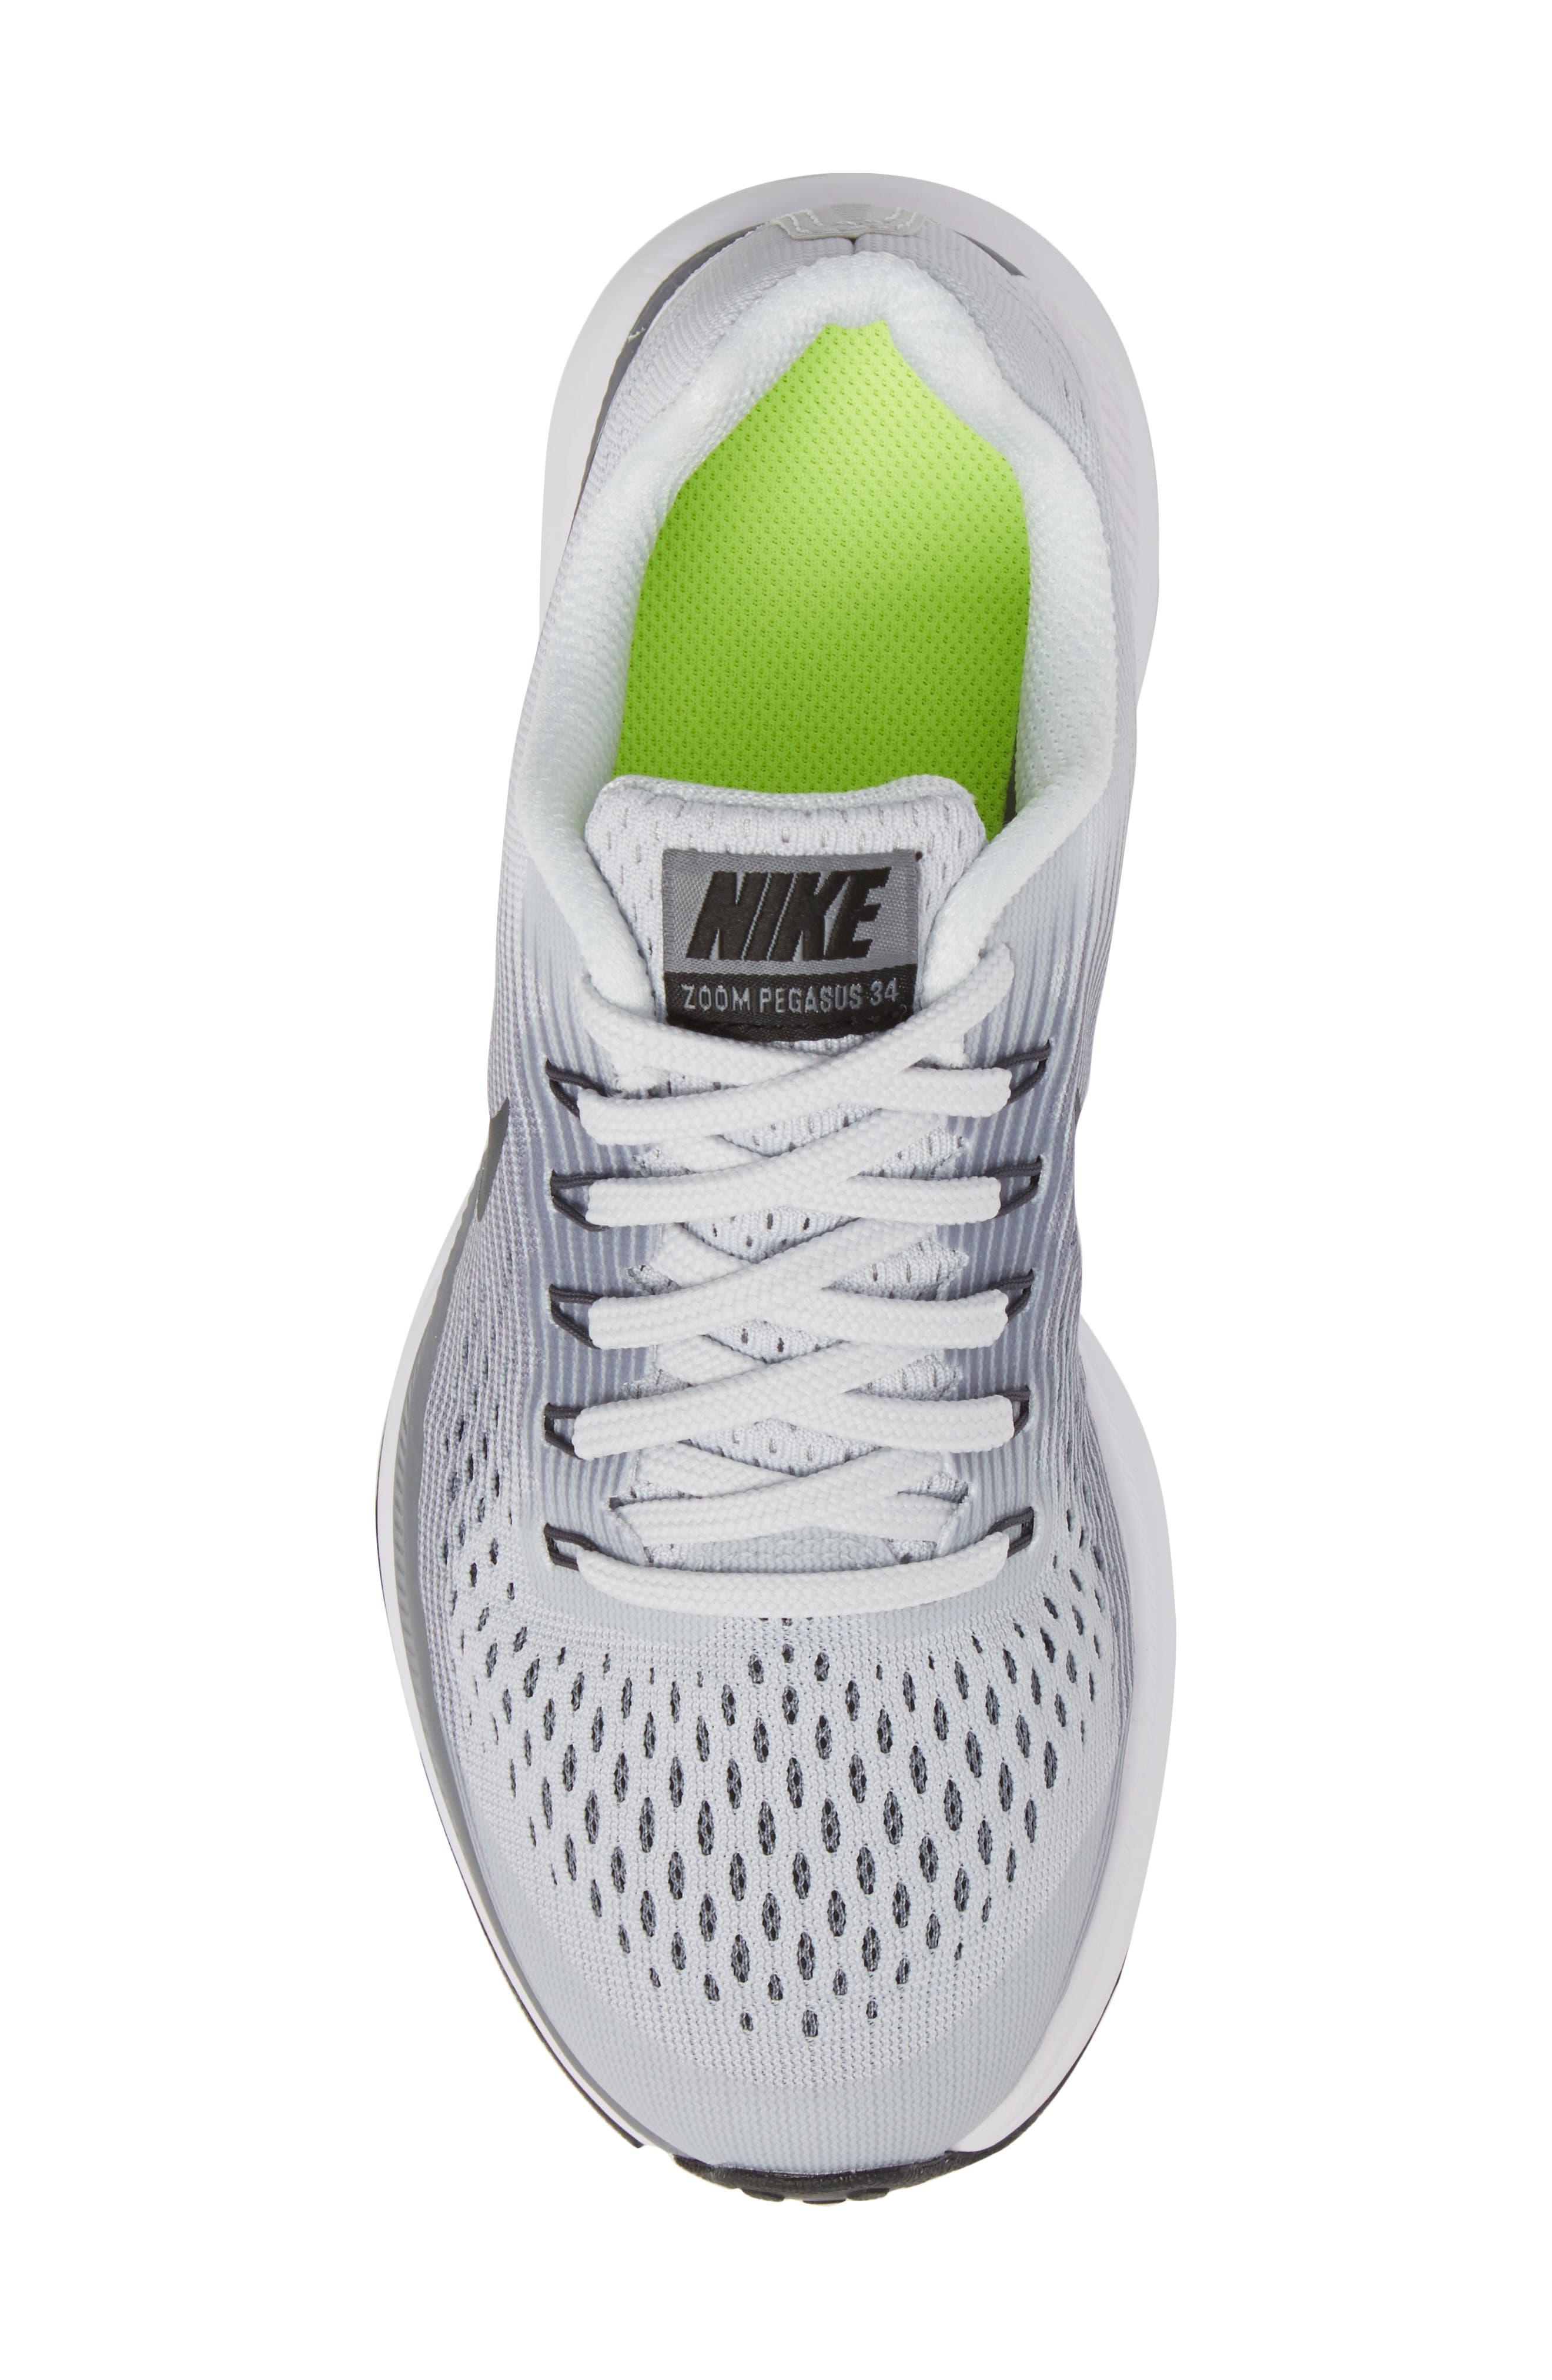 Zoom Pegasus 34 Sneaker,                             Alternate thumbnail 5, color,                             Platinum/ Anthracite/ Grey